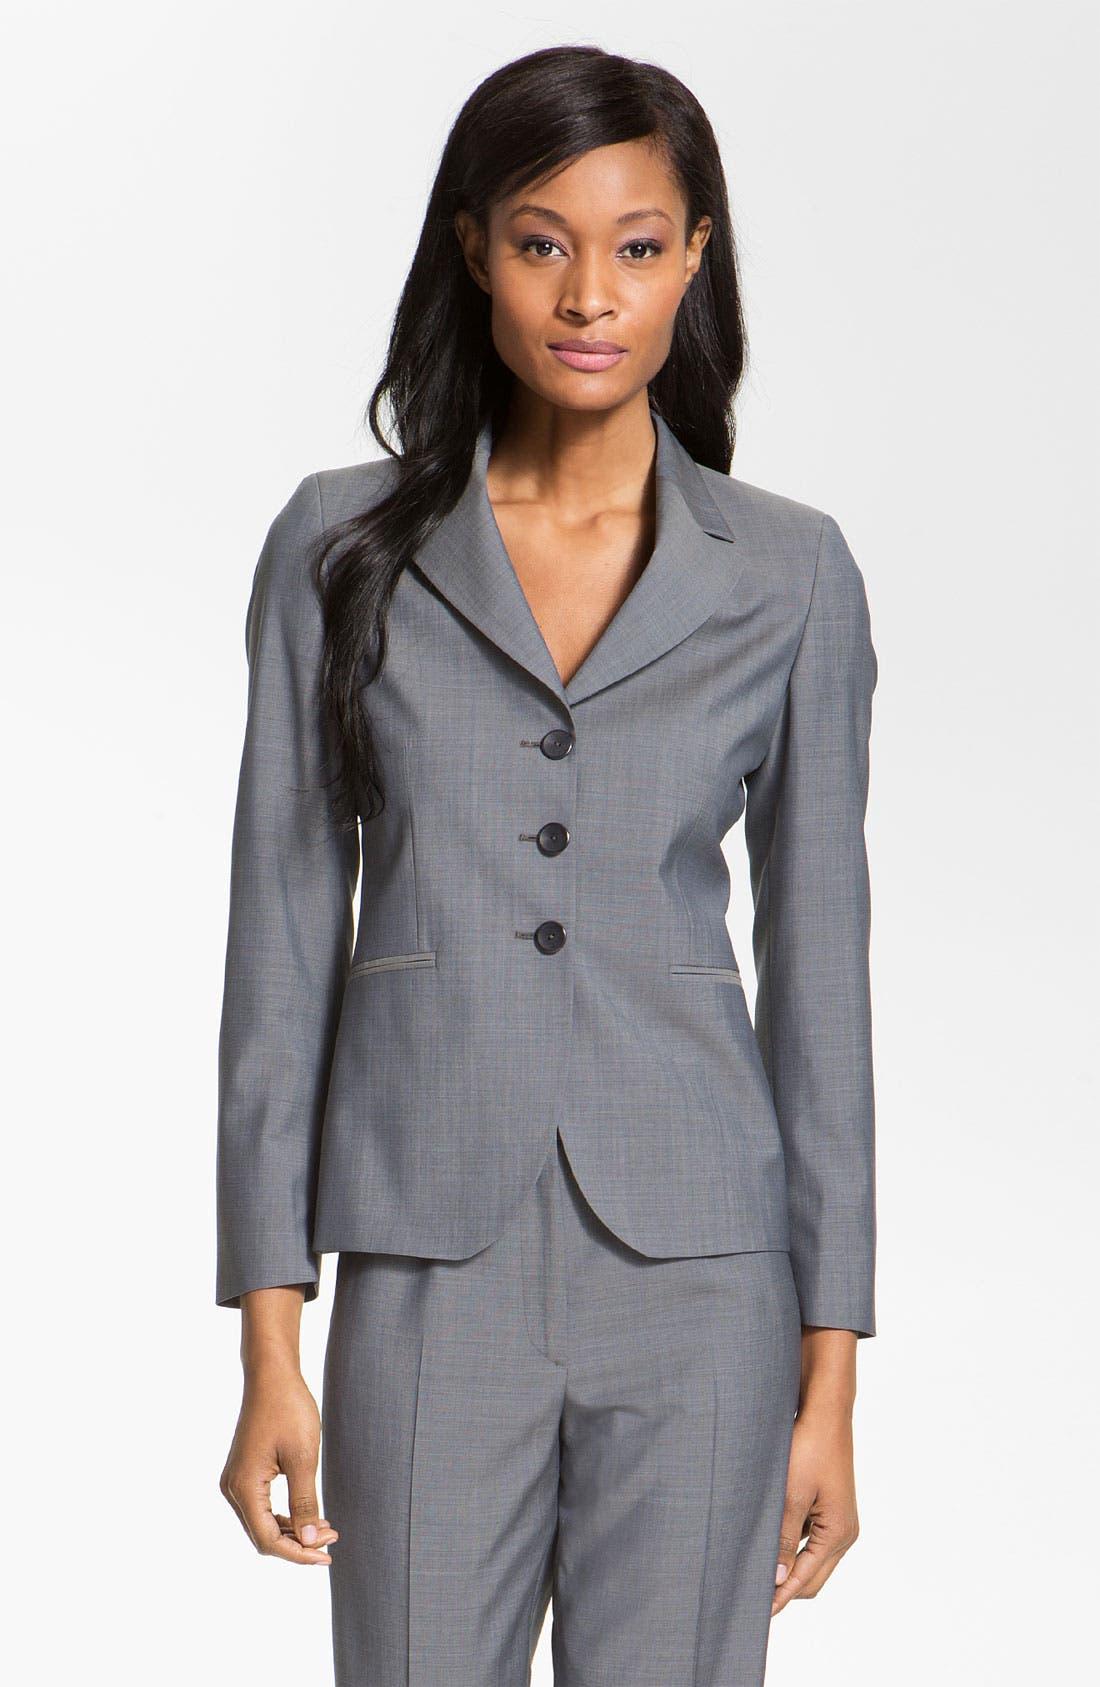 Main Image - Zanella 'Tracy' Suit Jacket